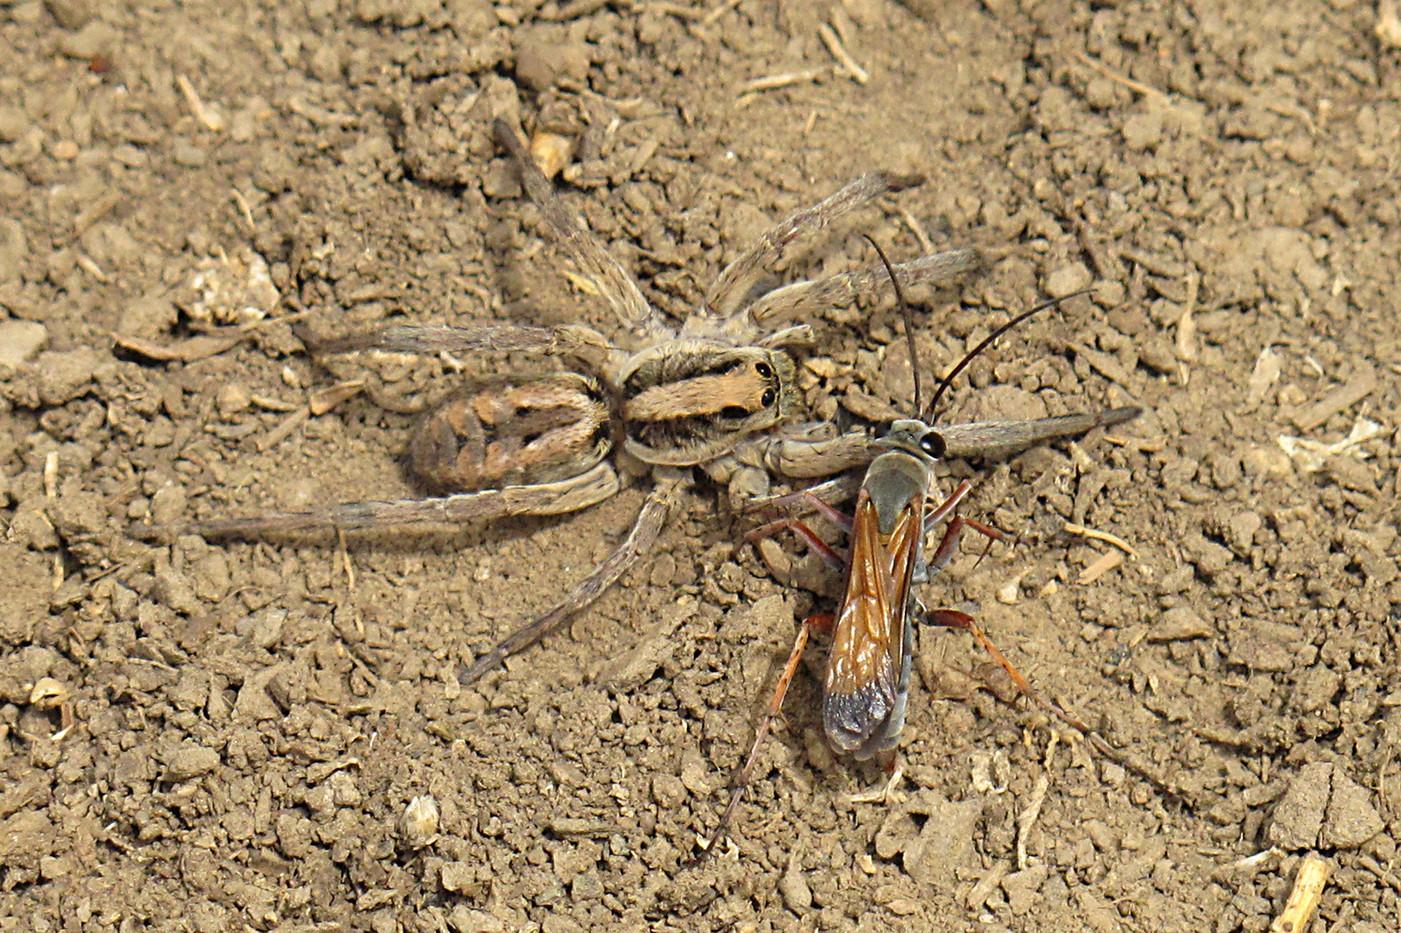 Parasitic Spider Wasp & Wolf Spider near Lake Natron, Tanzania